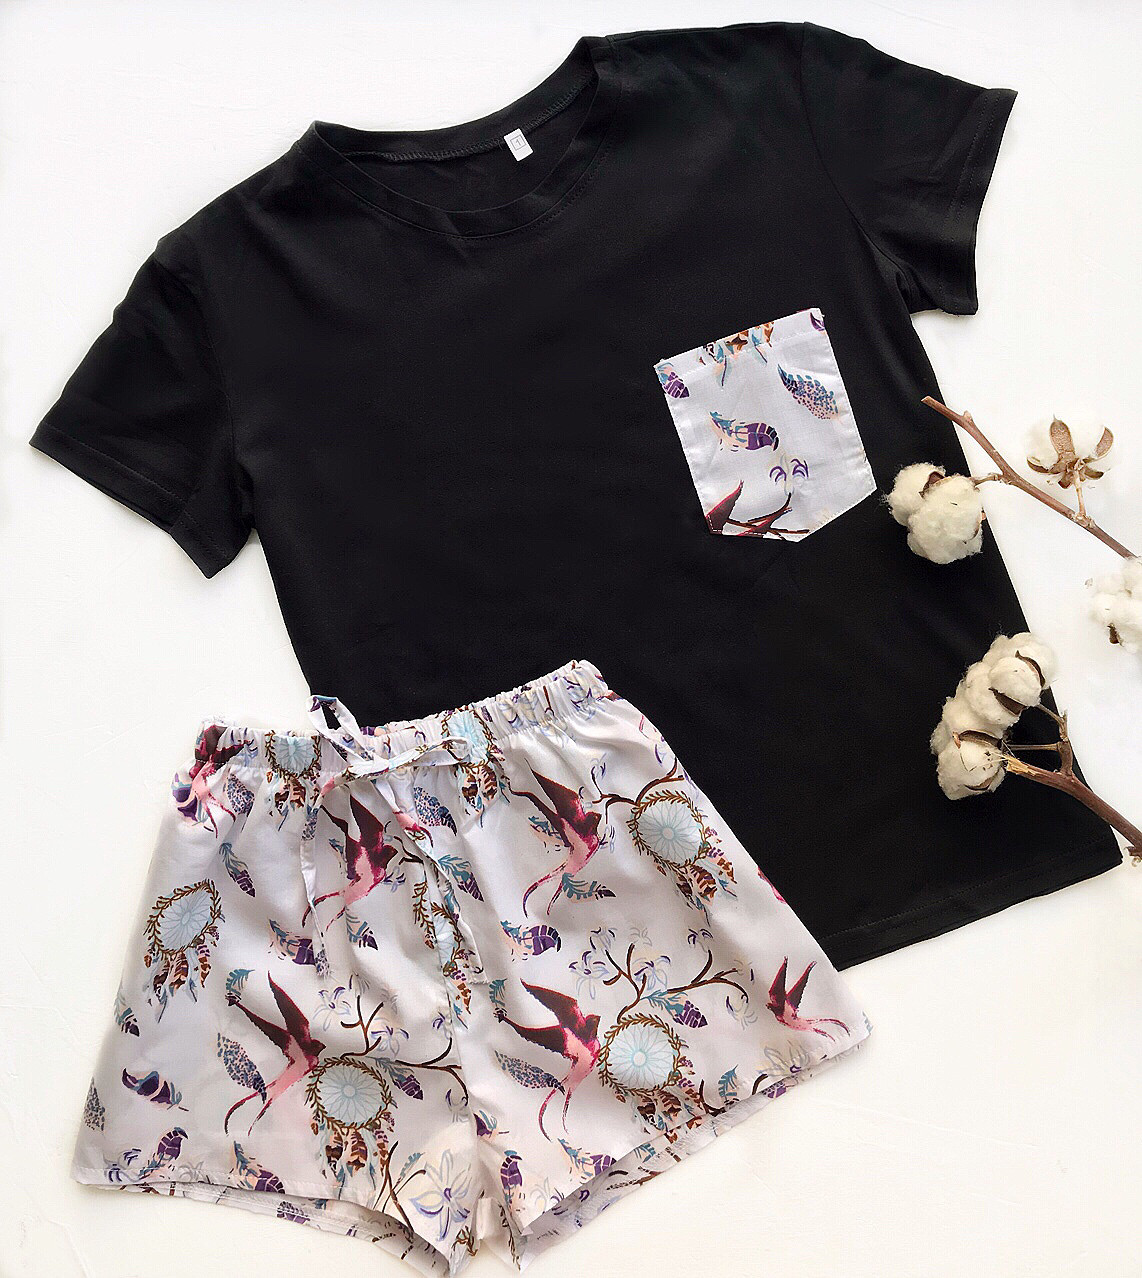 Пижама футболка и шорты S-M ловец снов